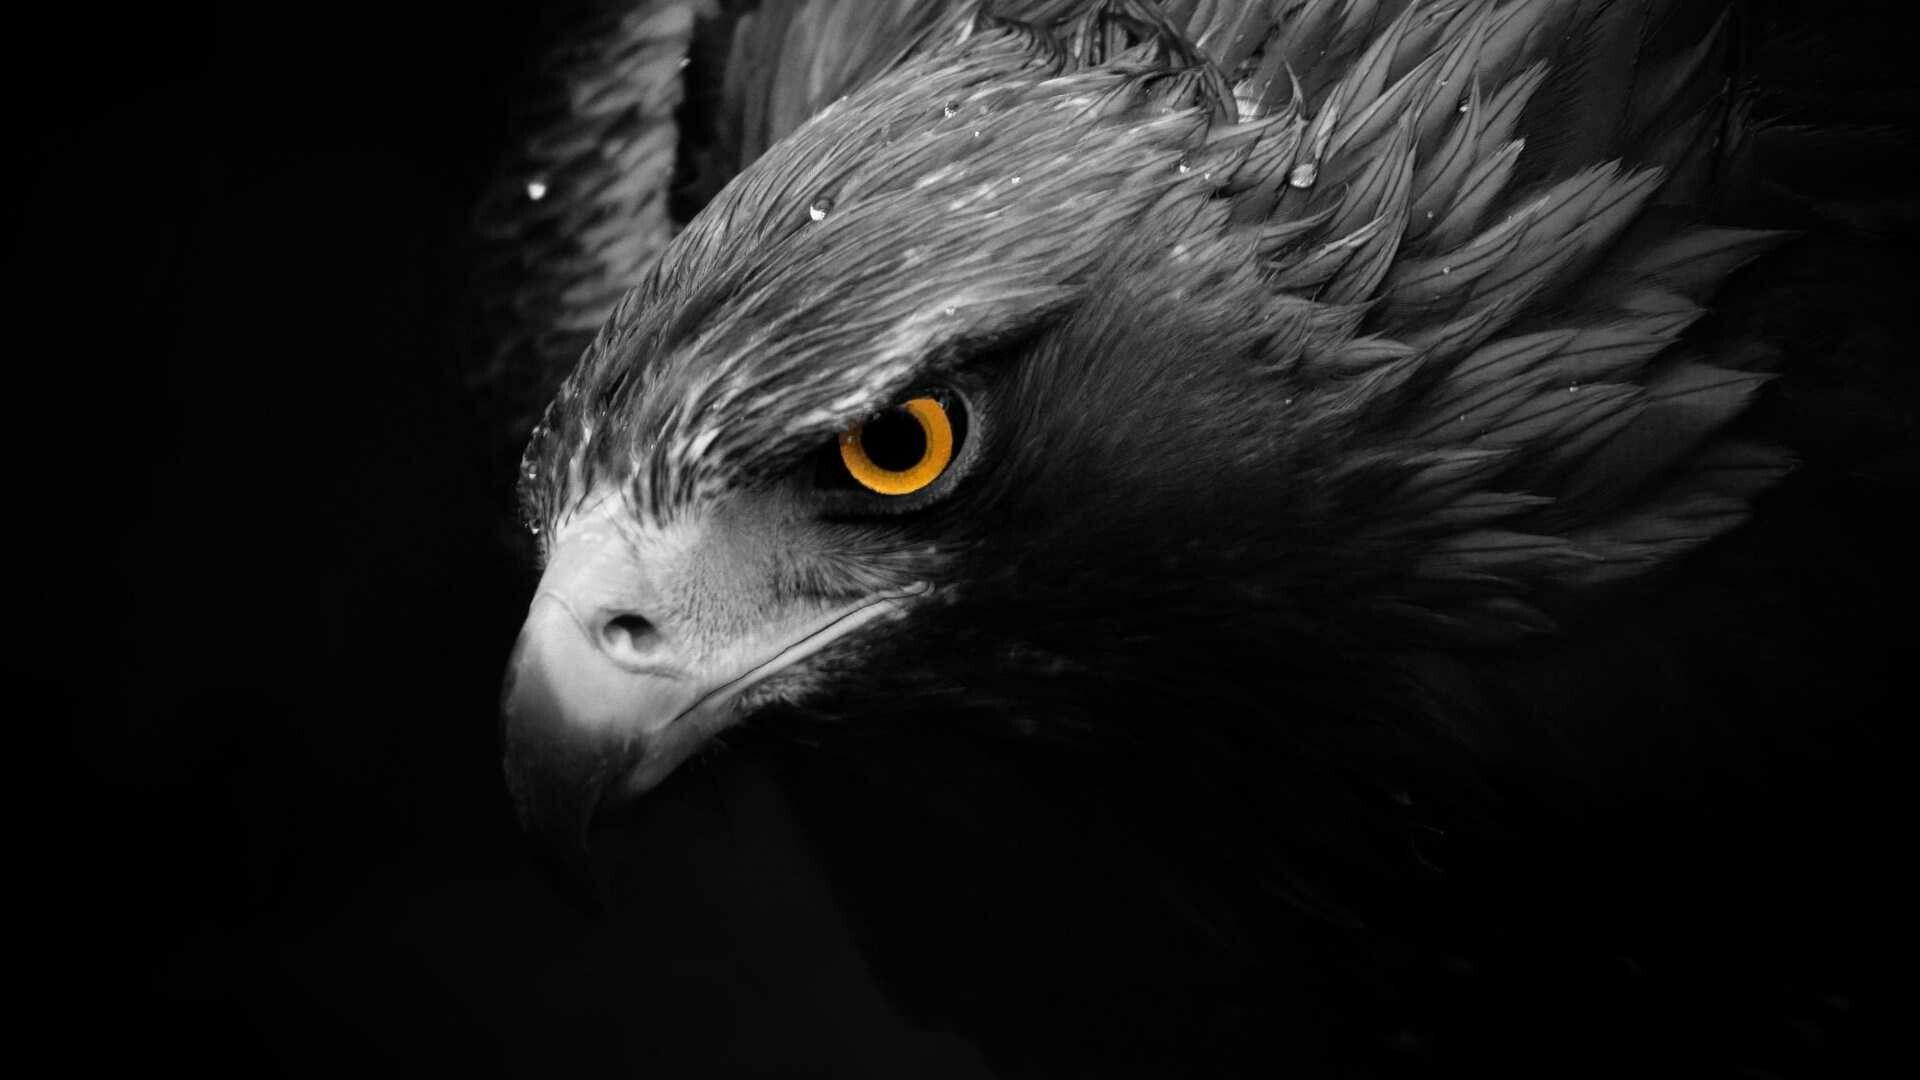 Black Eagle Eagle Wallpaper Birds Wallpaper Hd Animals Eagle black and white hd wallpaper